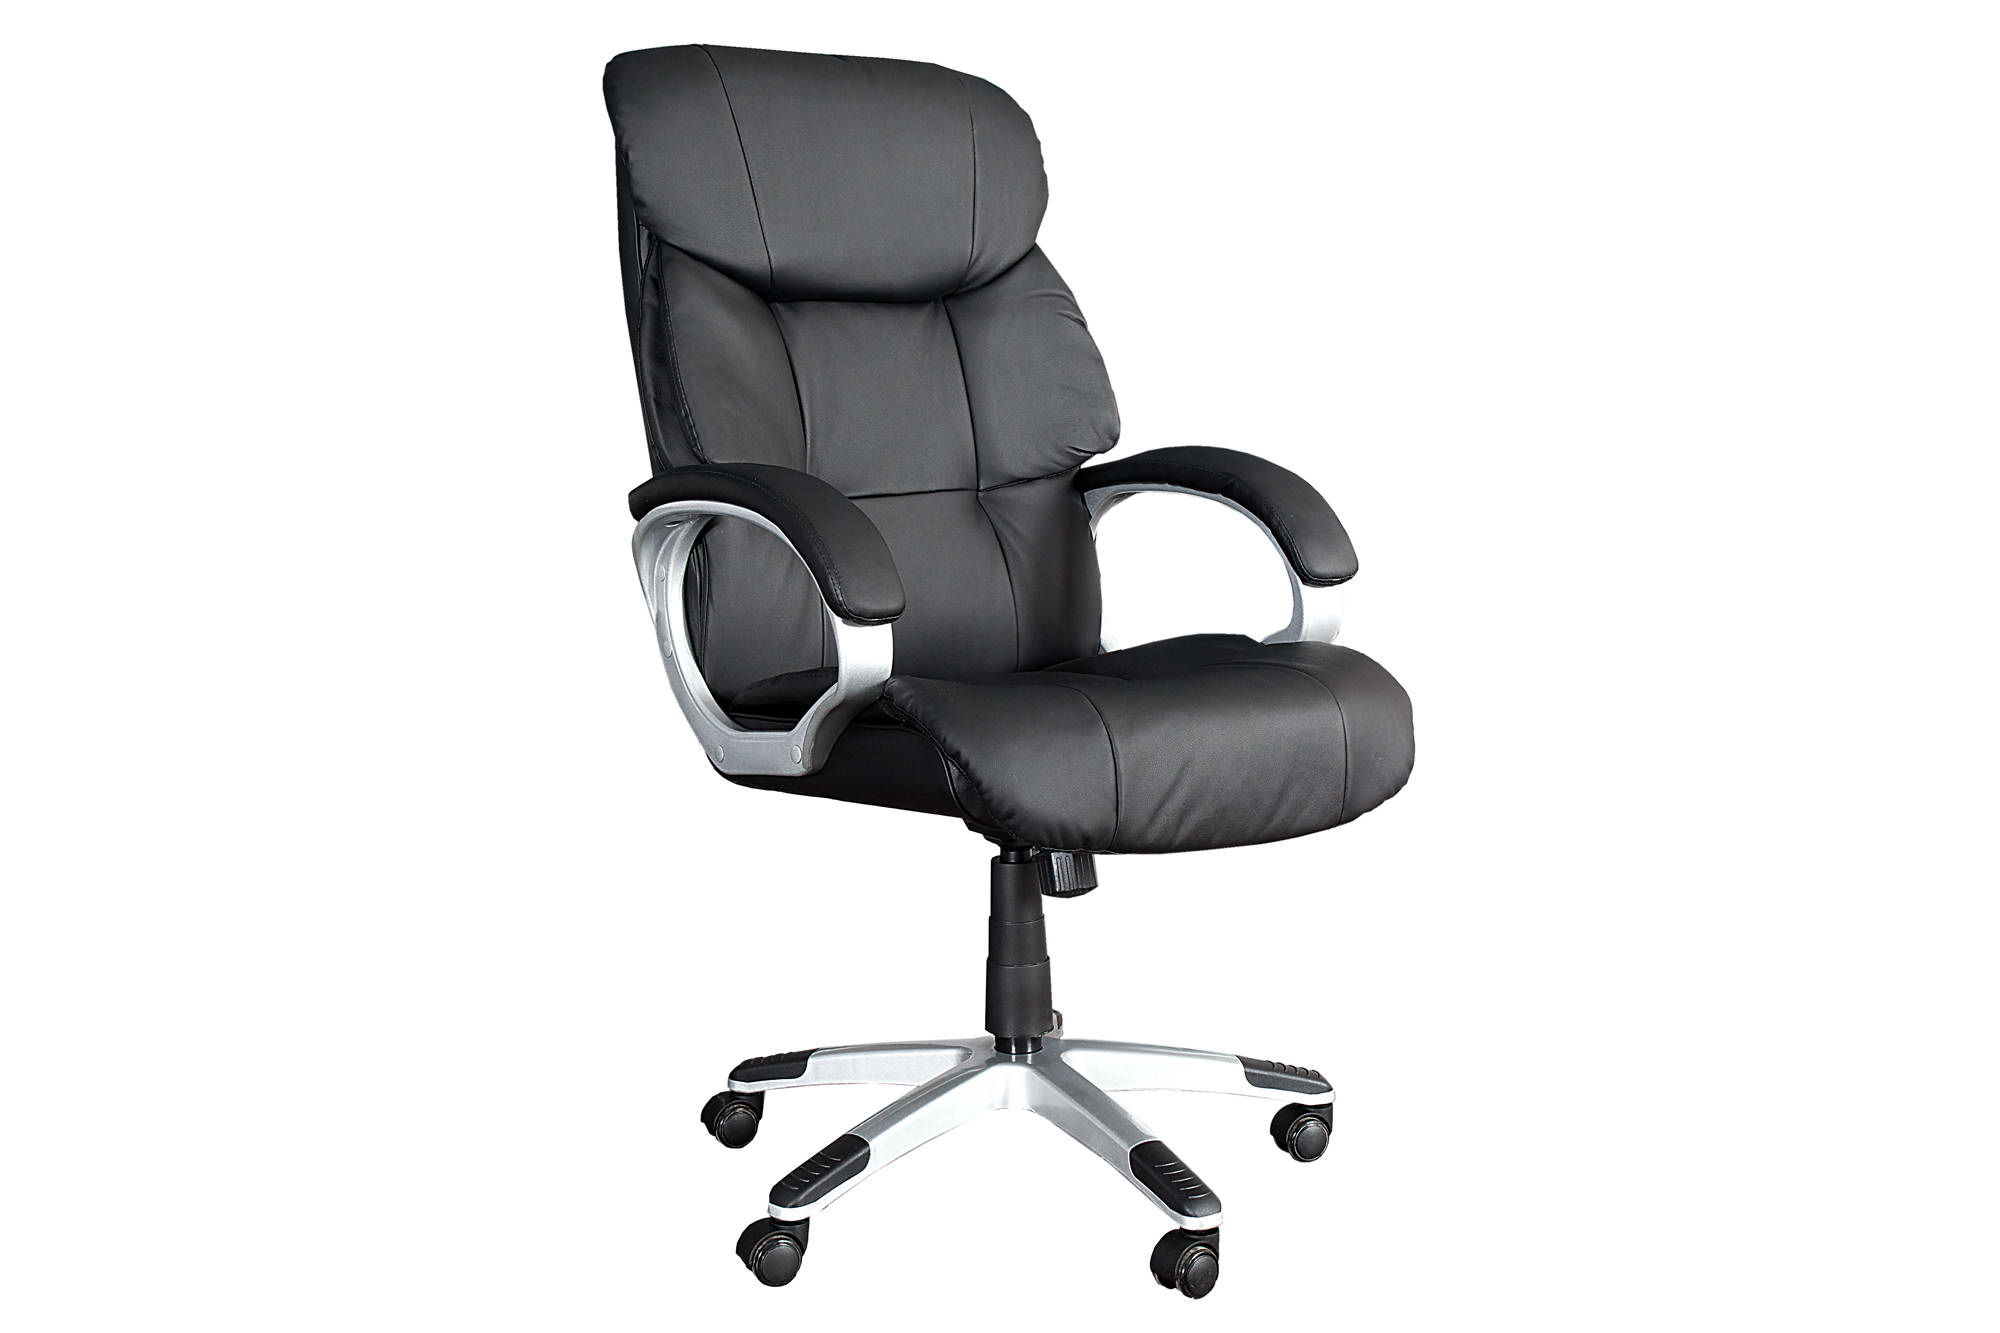 Irodai szék Powerful 150kg-ig - fekete